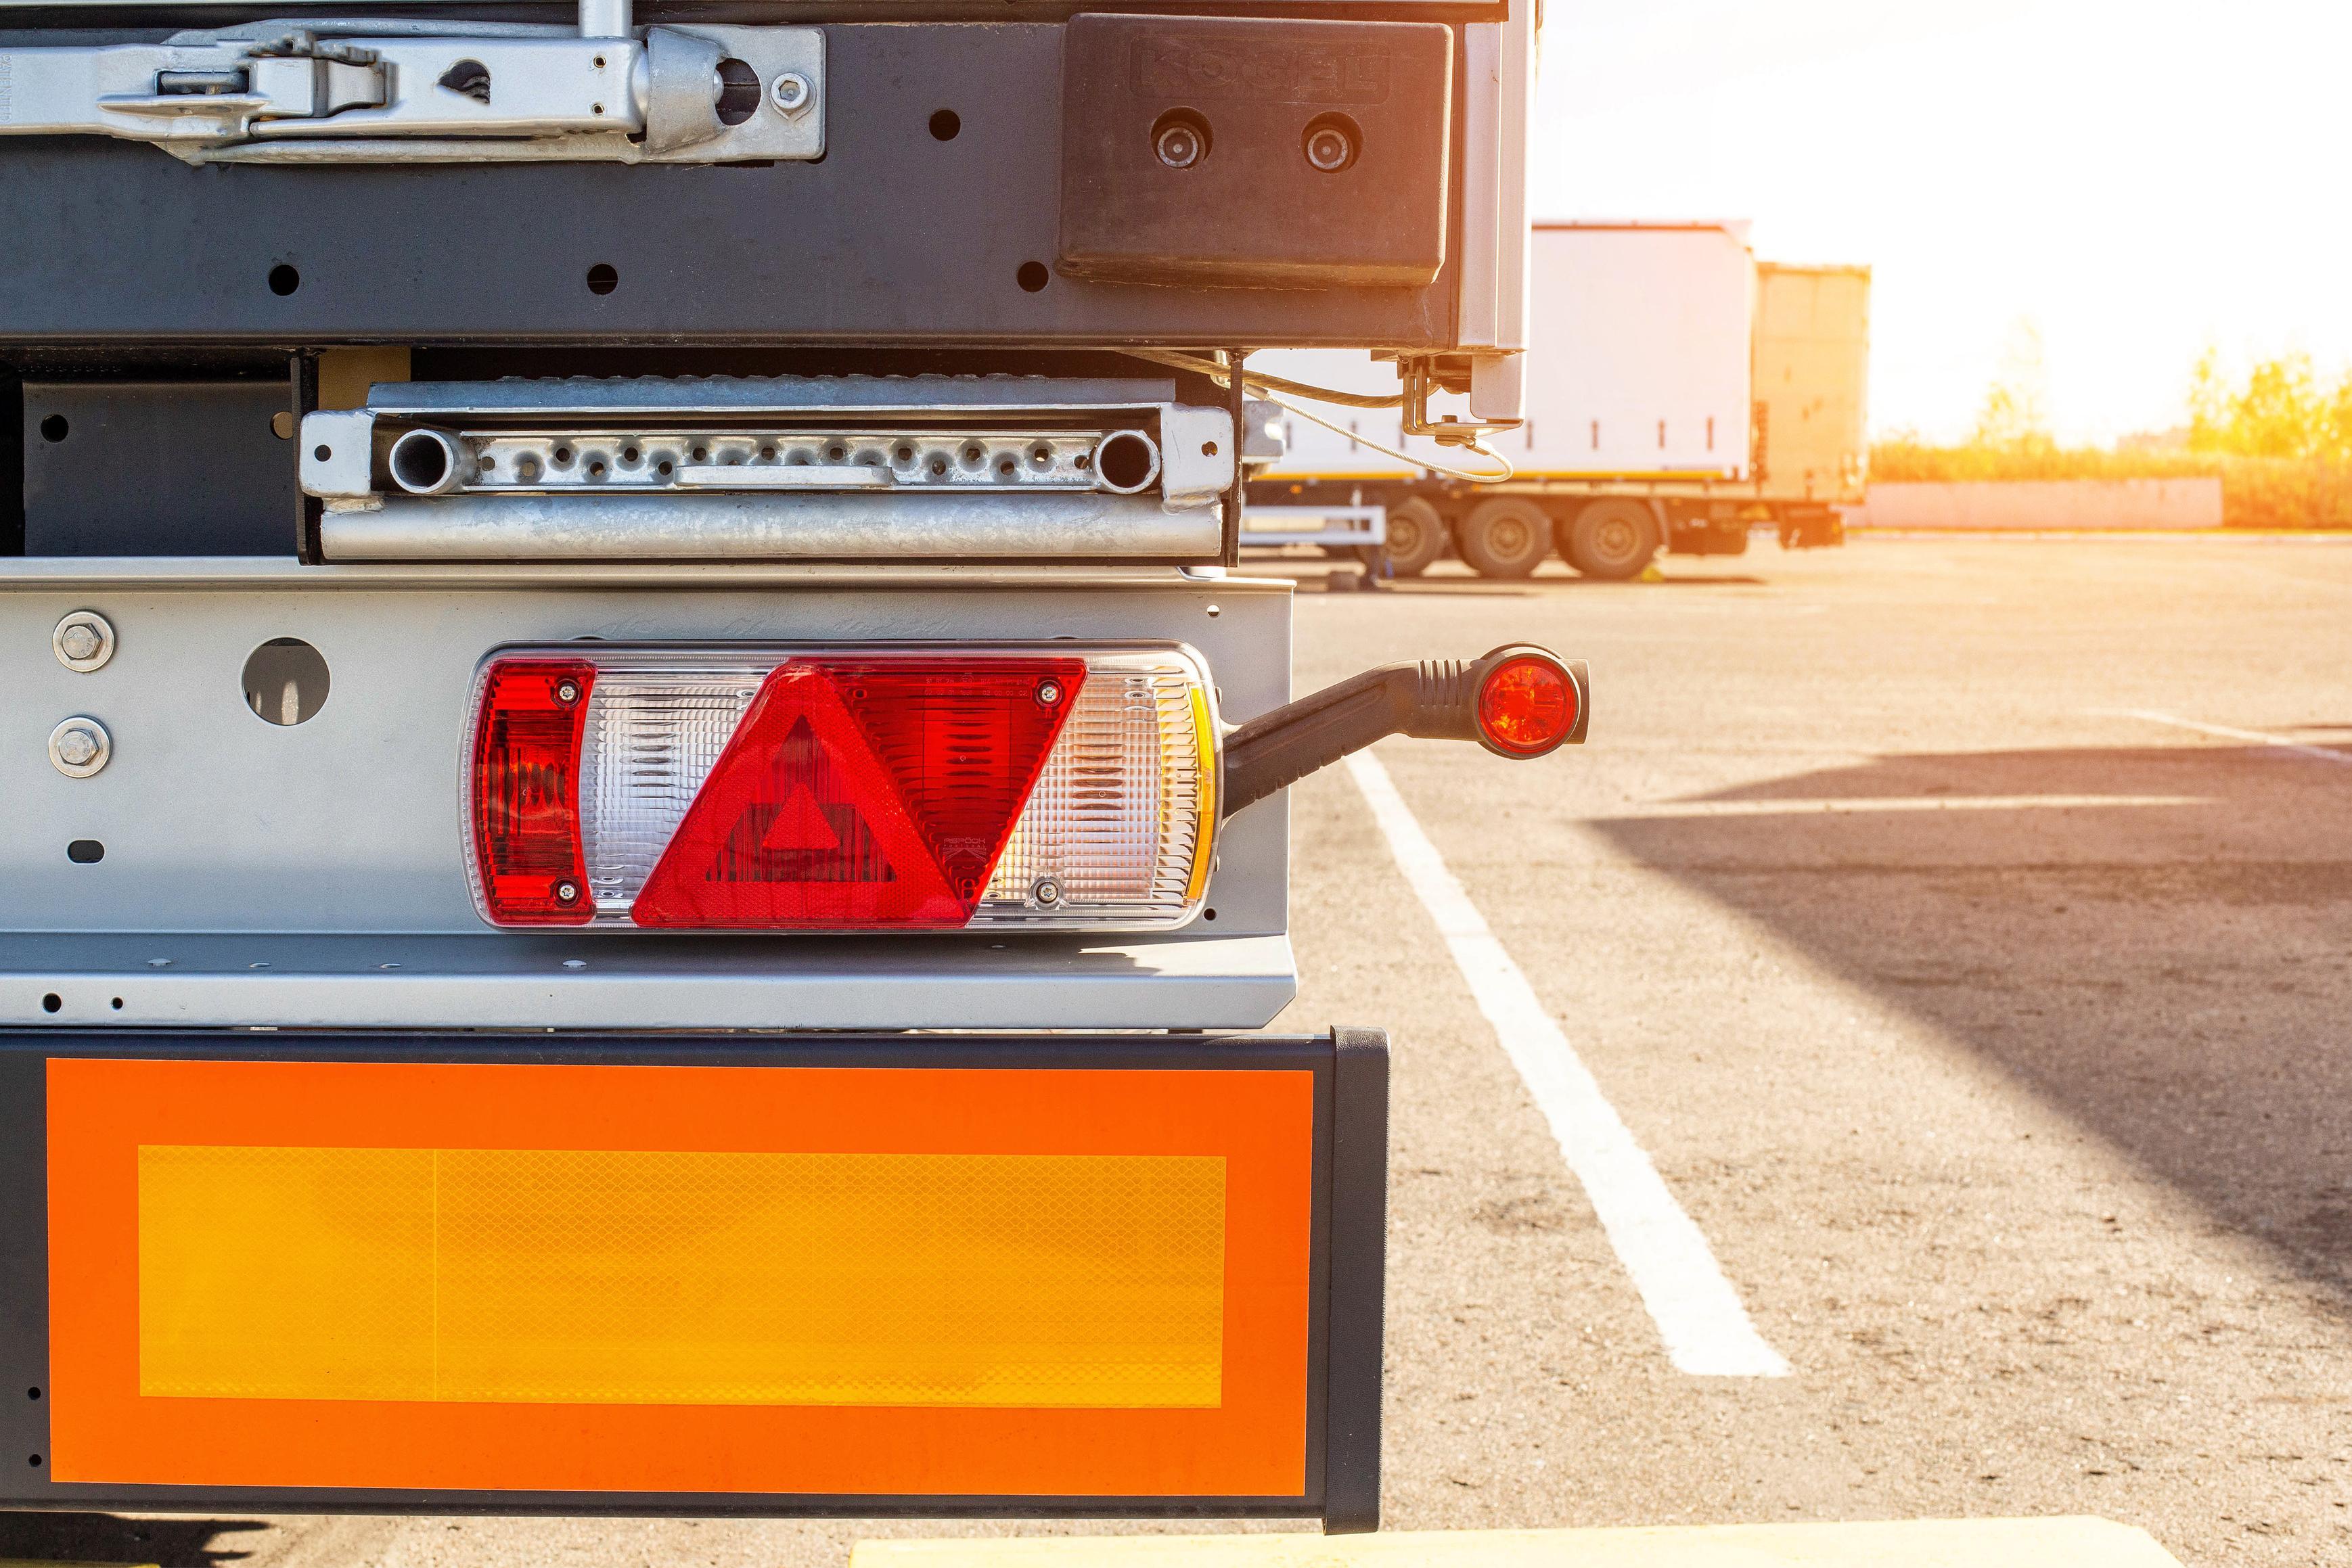 140517810-truck-driver-semitrailer-rear-